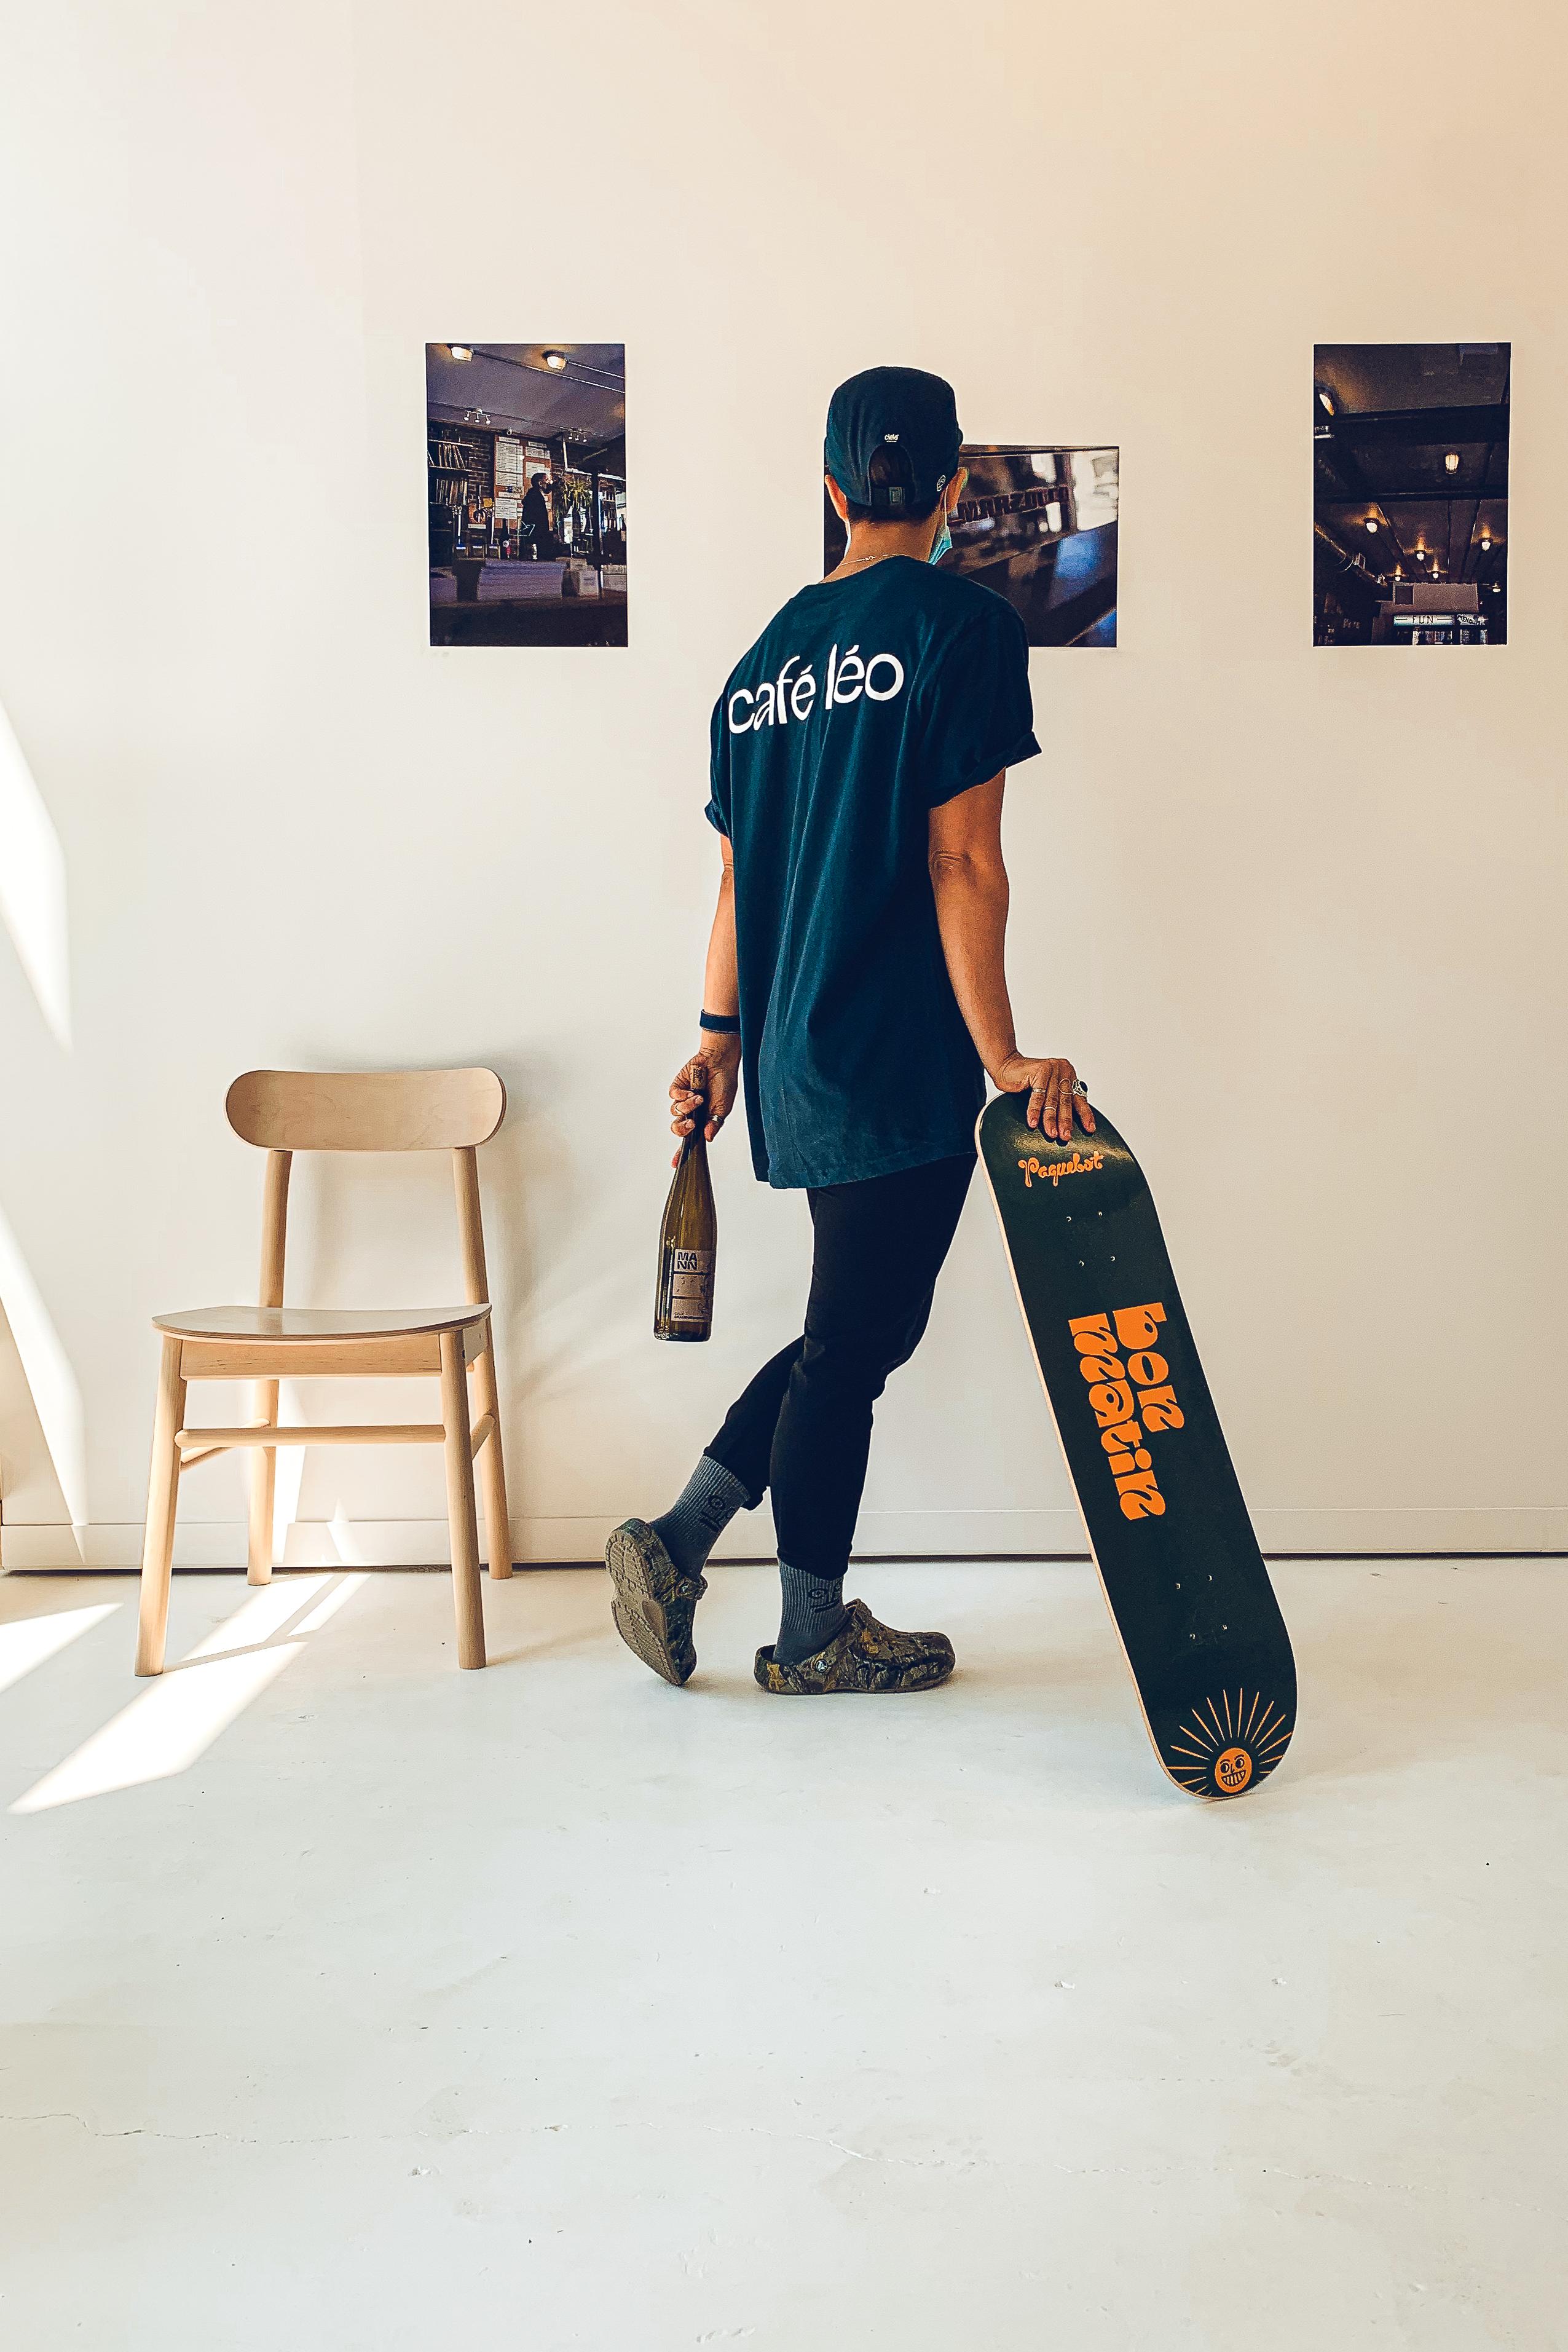 guy holding skateboard looking at photos